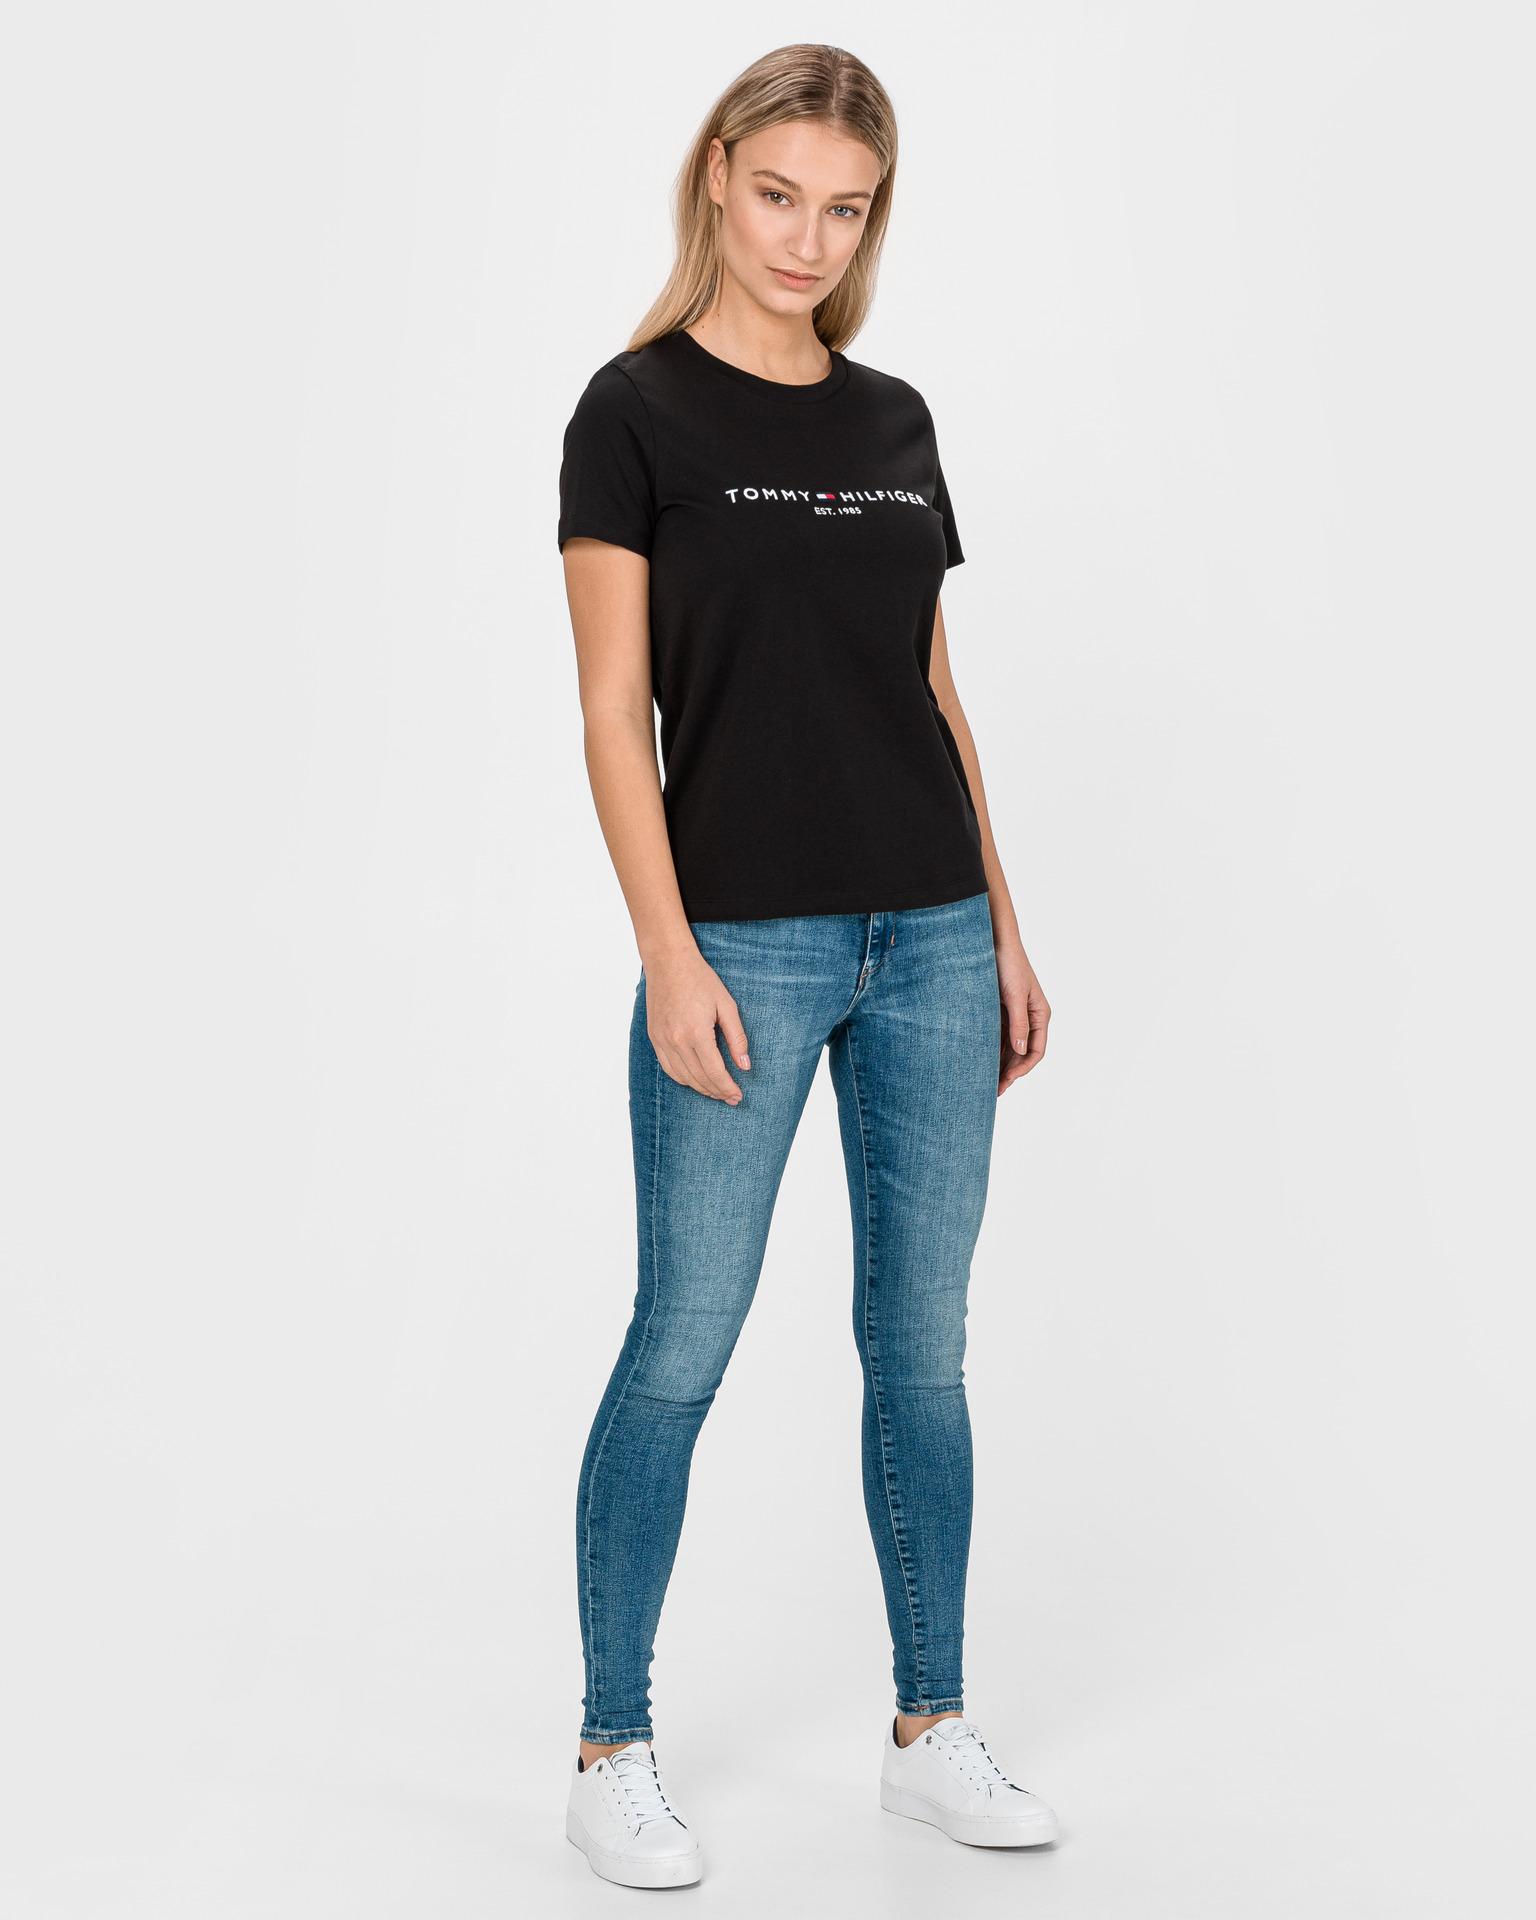 Tommy Hilfiger negre de dama tricou Essential